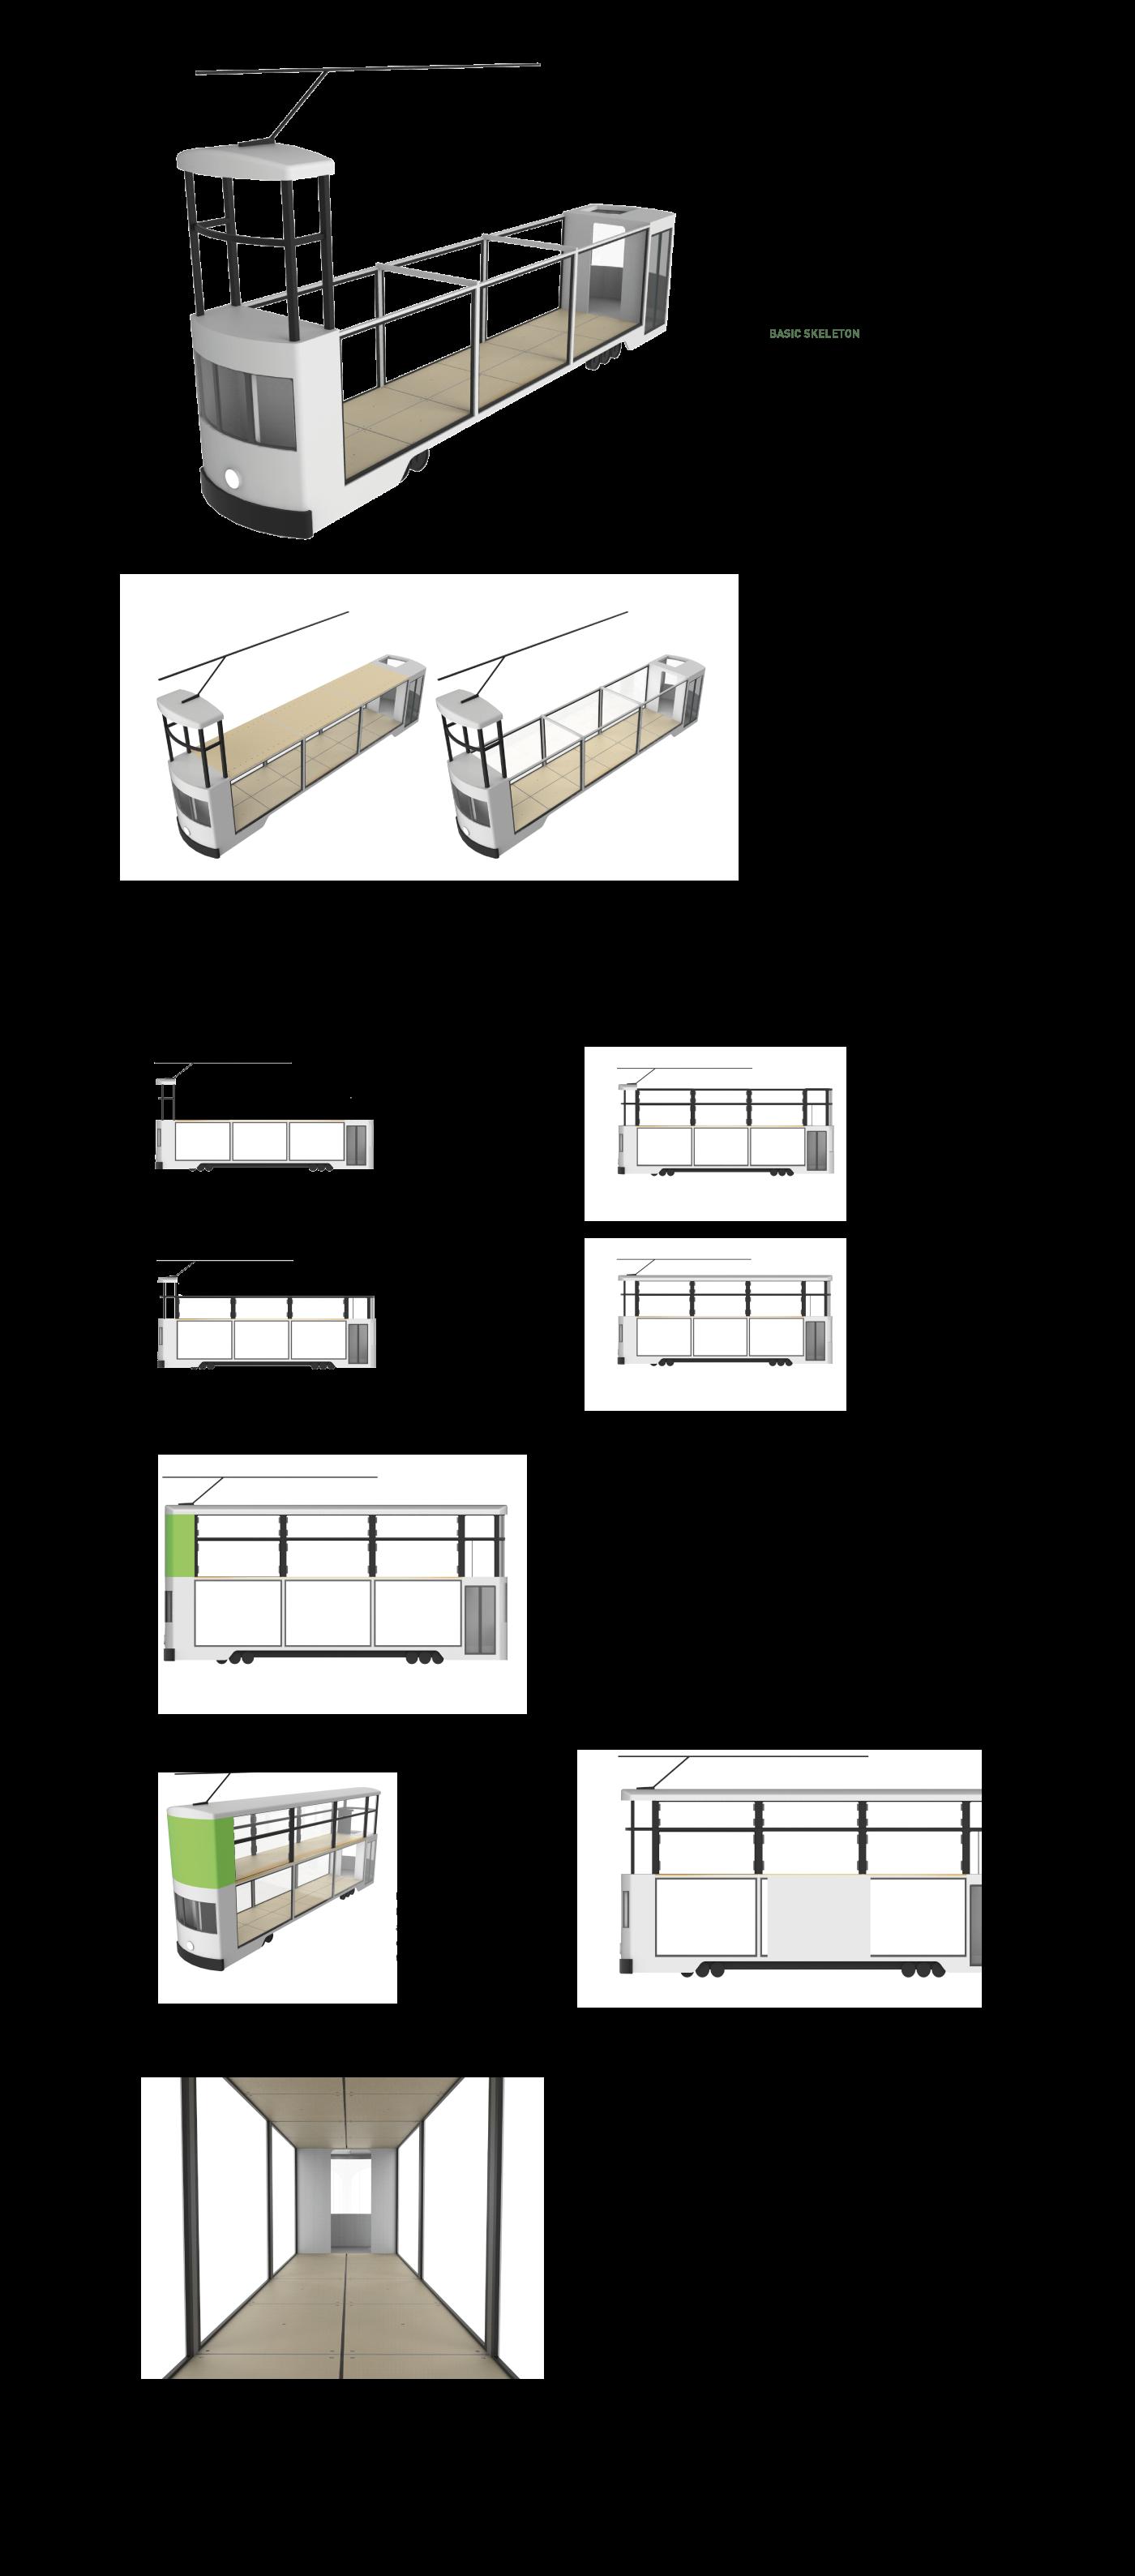 tram,interactive,Promotion,identity,publication,Web,Transport,modular